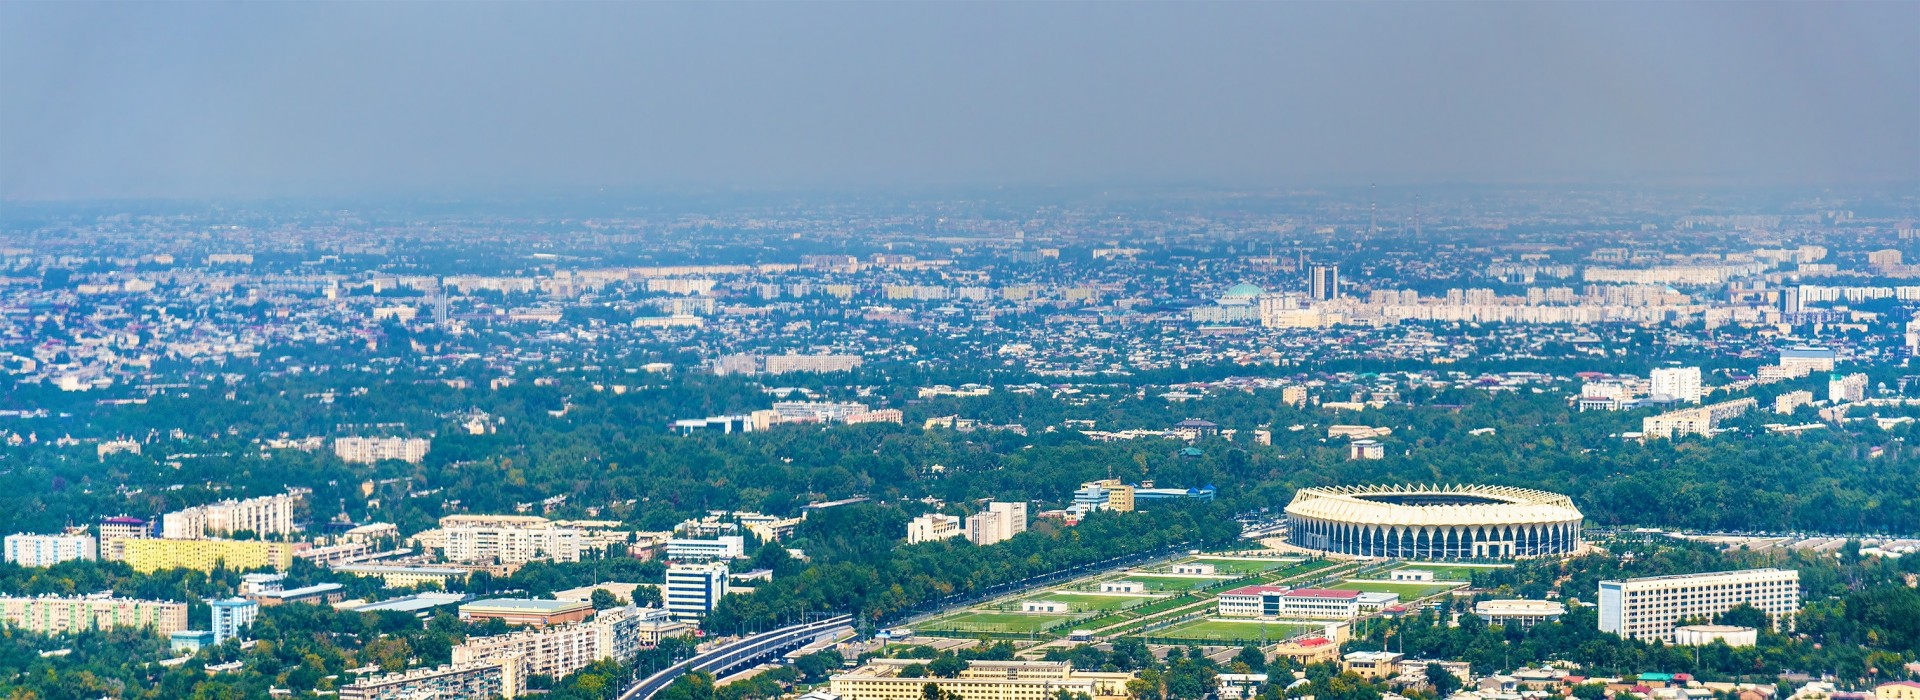 Aerial view of Tashkent in Uzbekistan